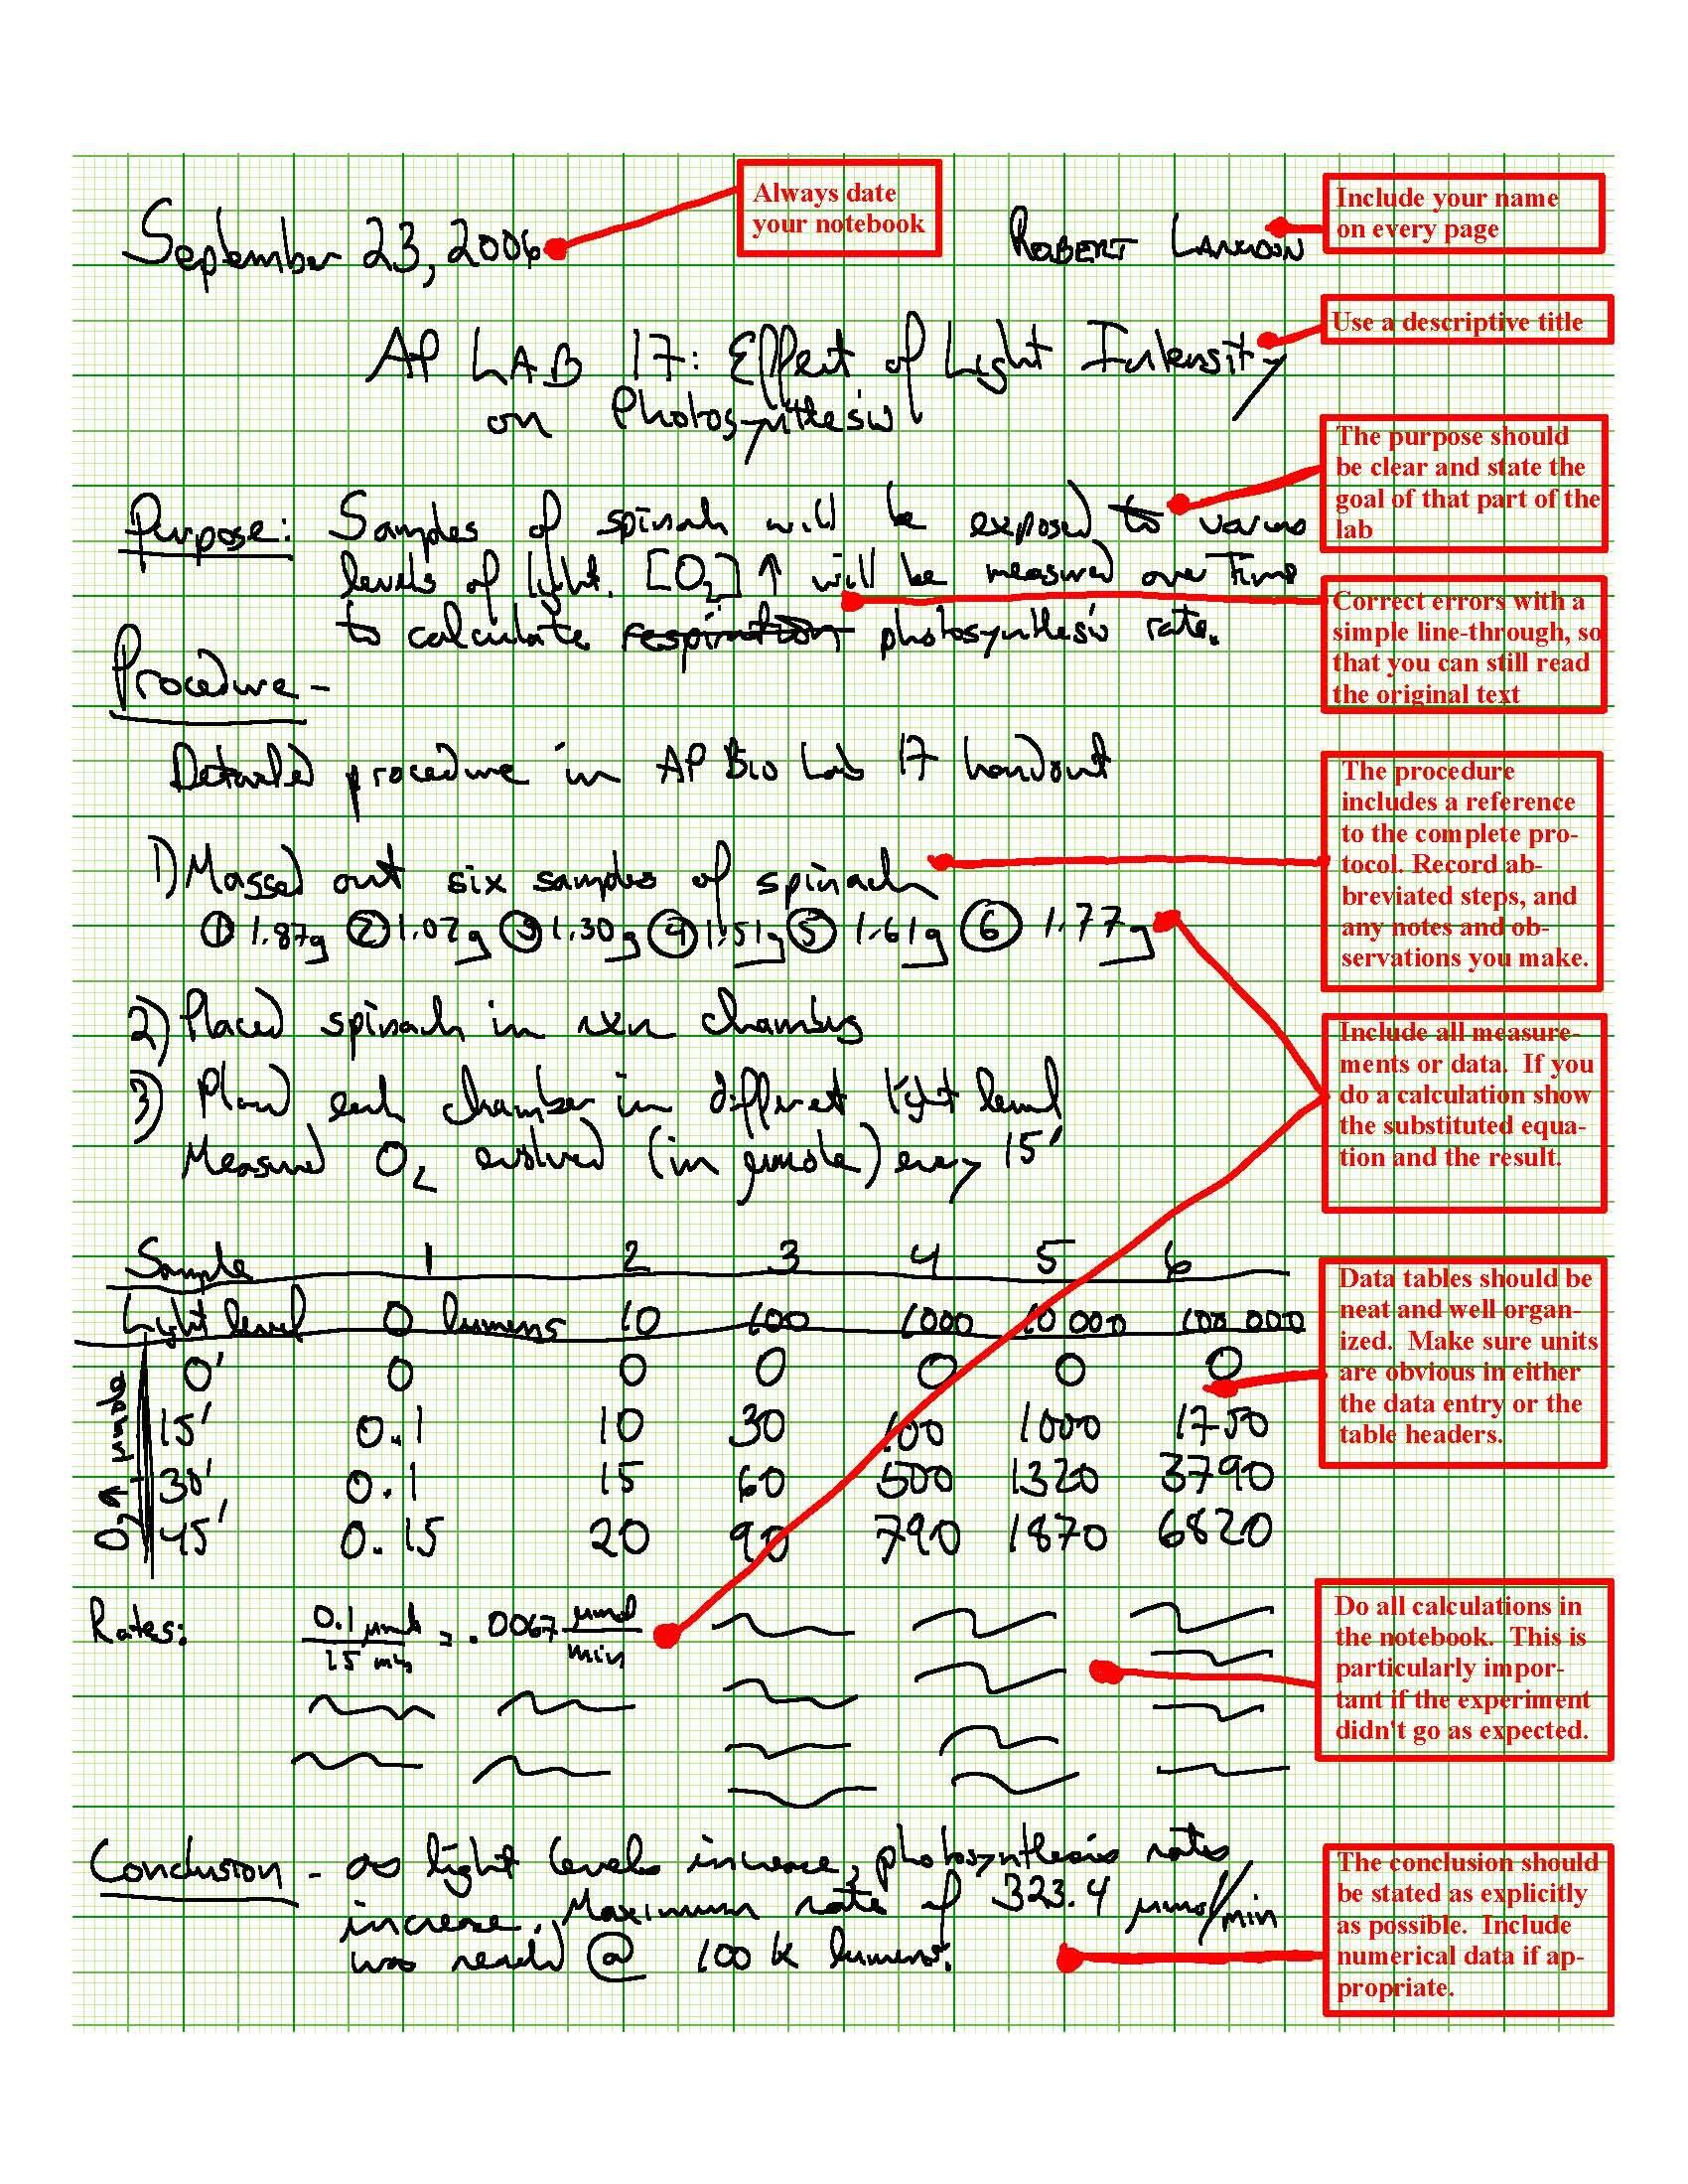 Sample AP Biology lab notebook page | AP Biology | Pinterest ...